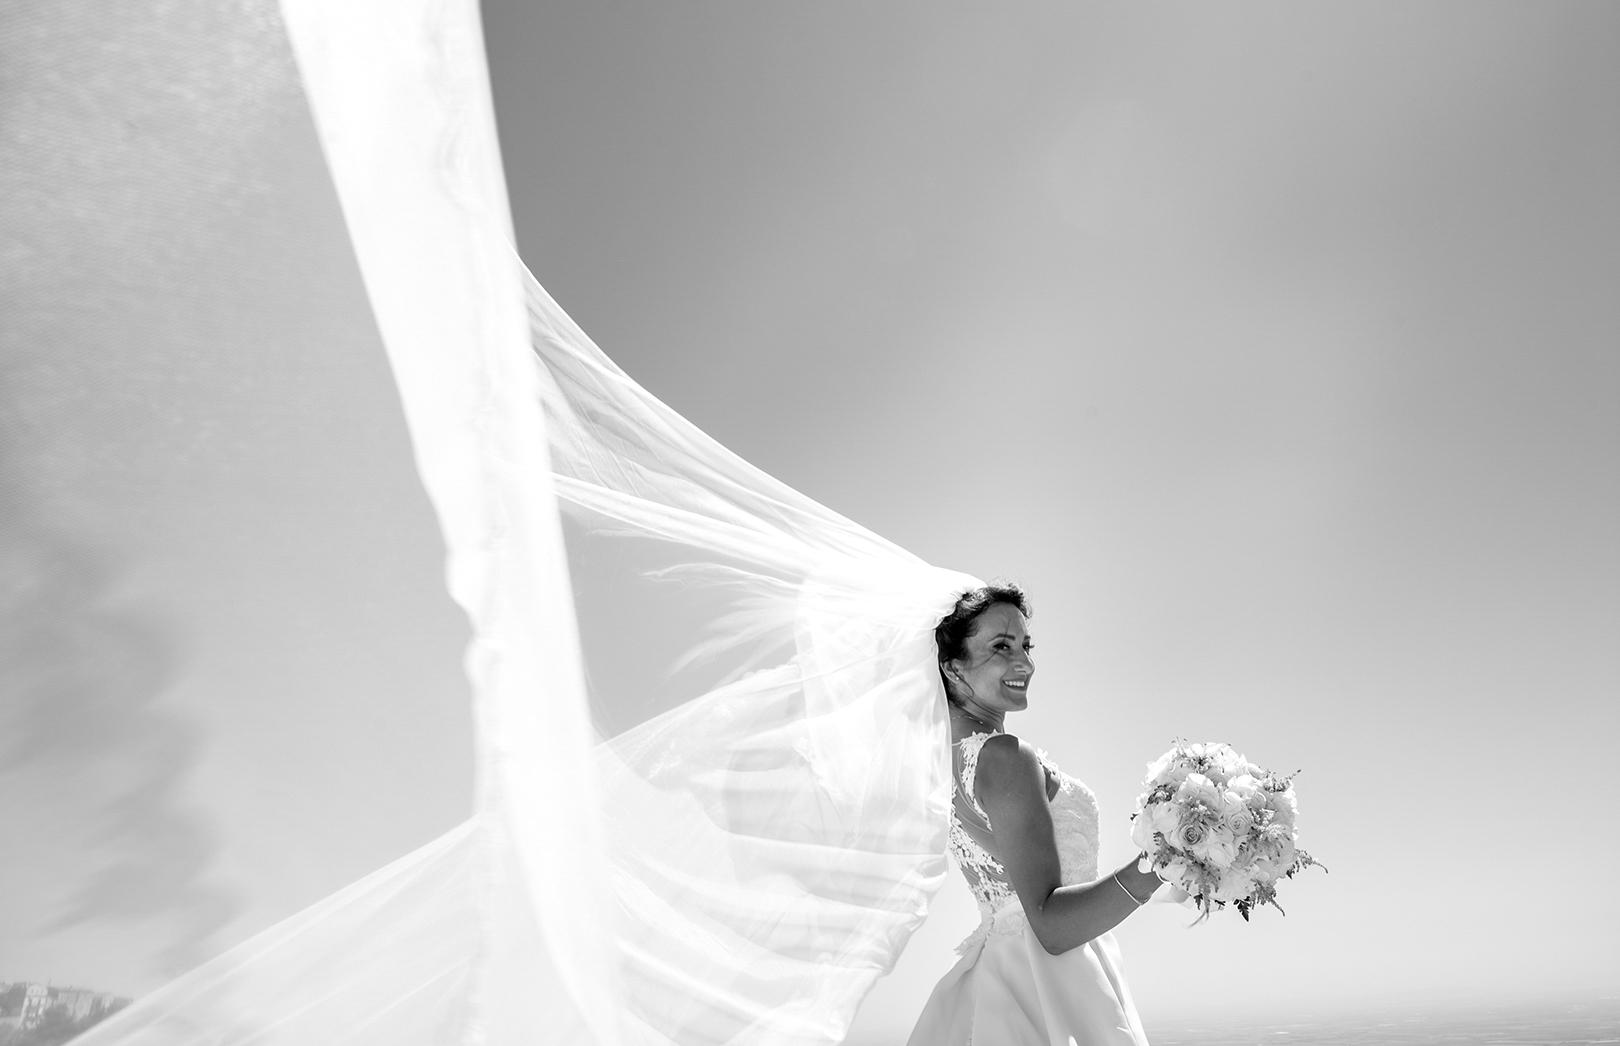 22 gianni-leporesposa-bride-bianco-nero